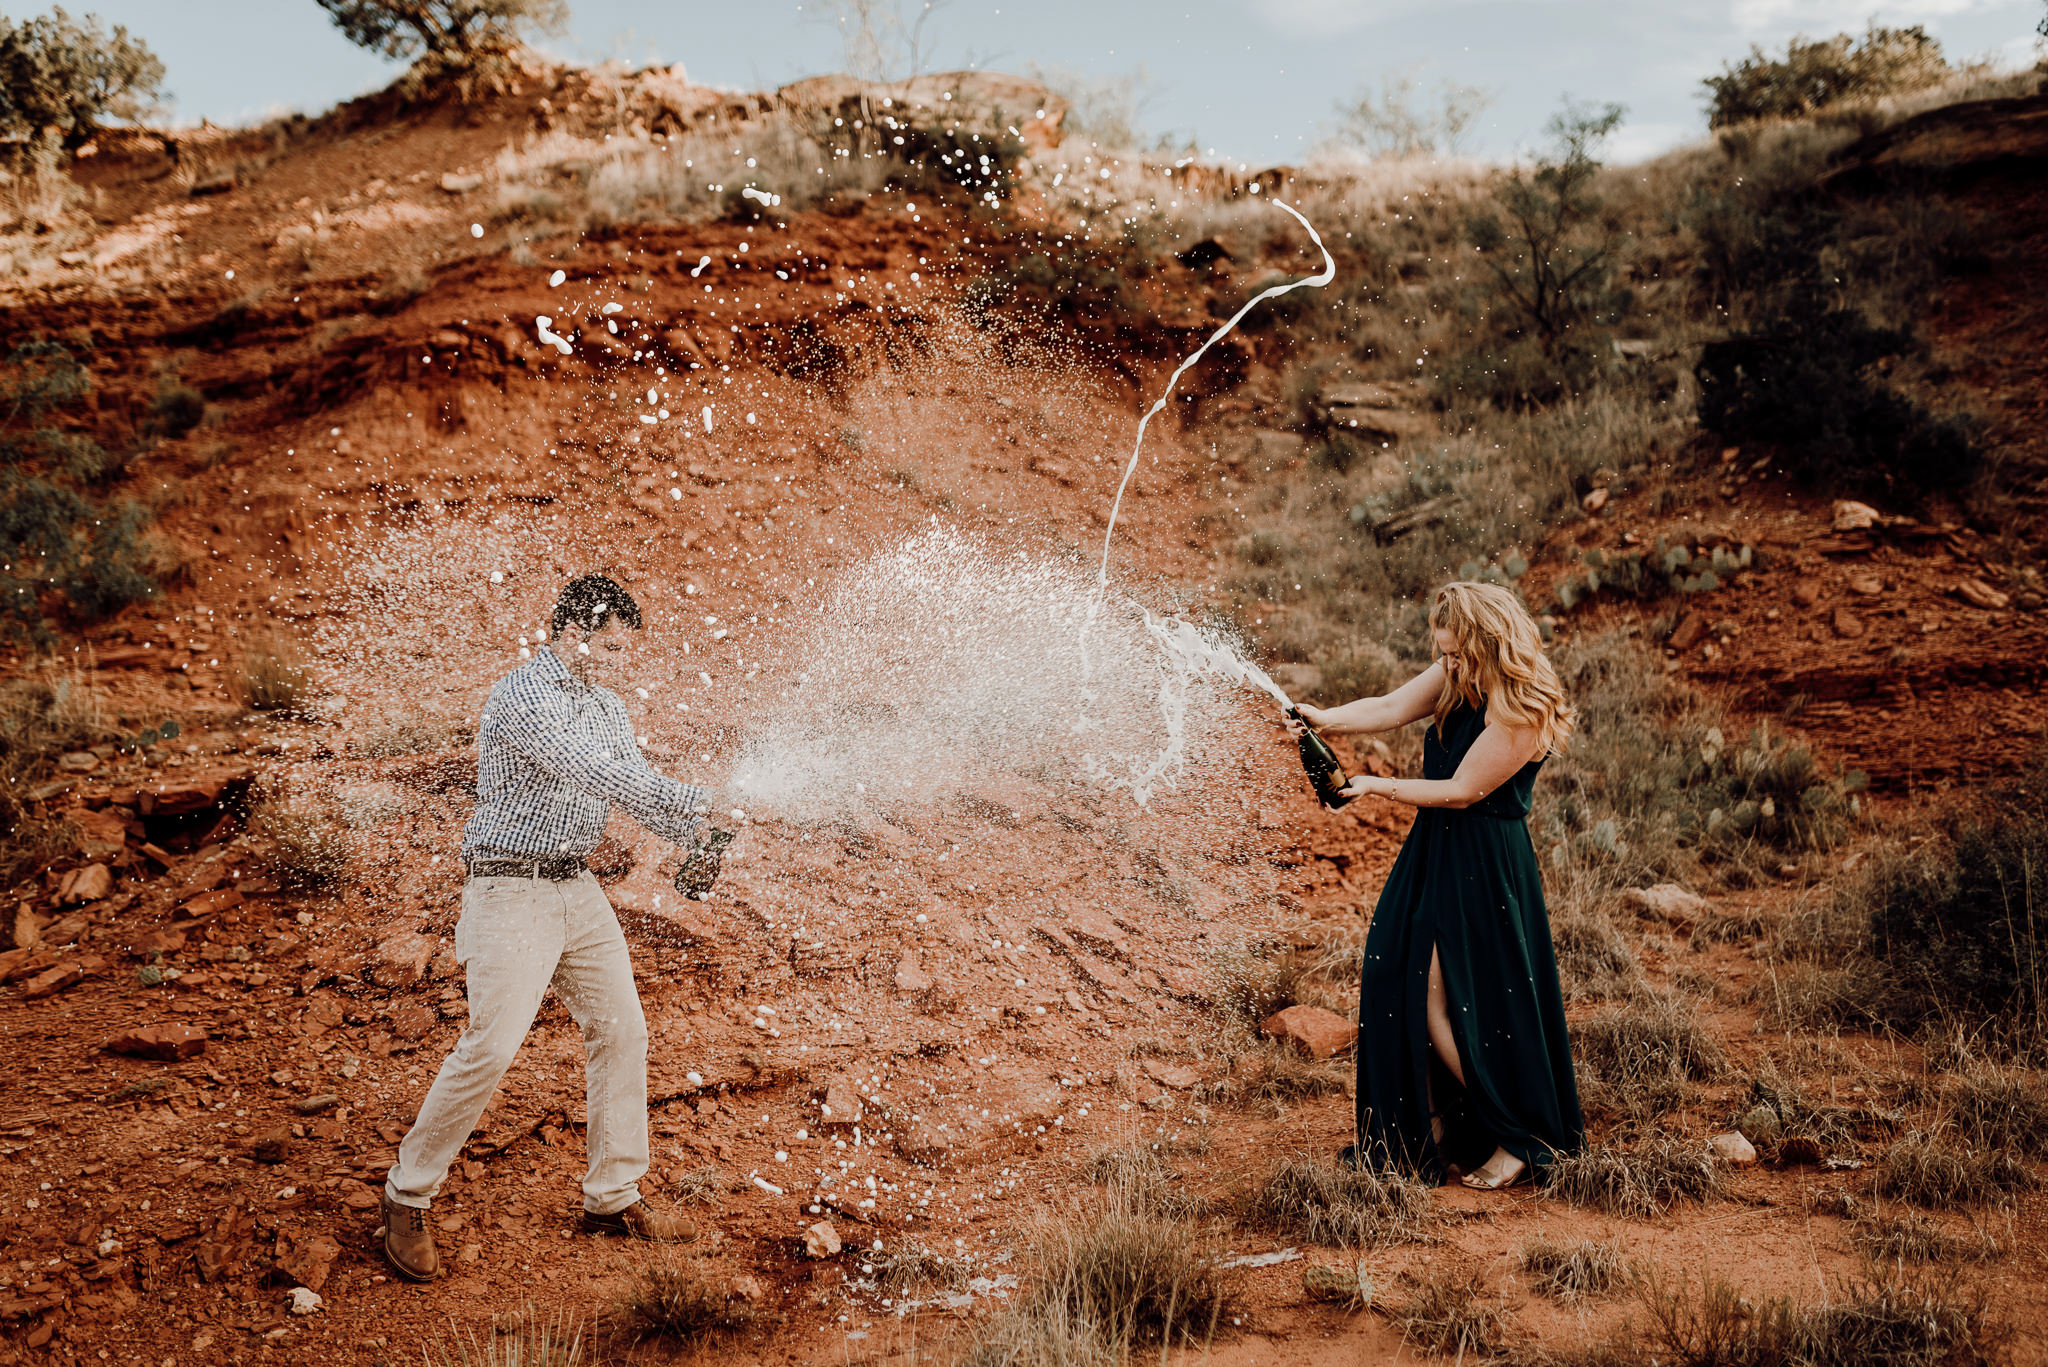 Houston Wedding Photographer-Palo Duro Canyon Engagement Session- Houston Wedding Photographer -Kristen Giles Photography-27.jpg